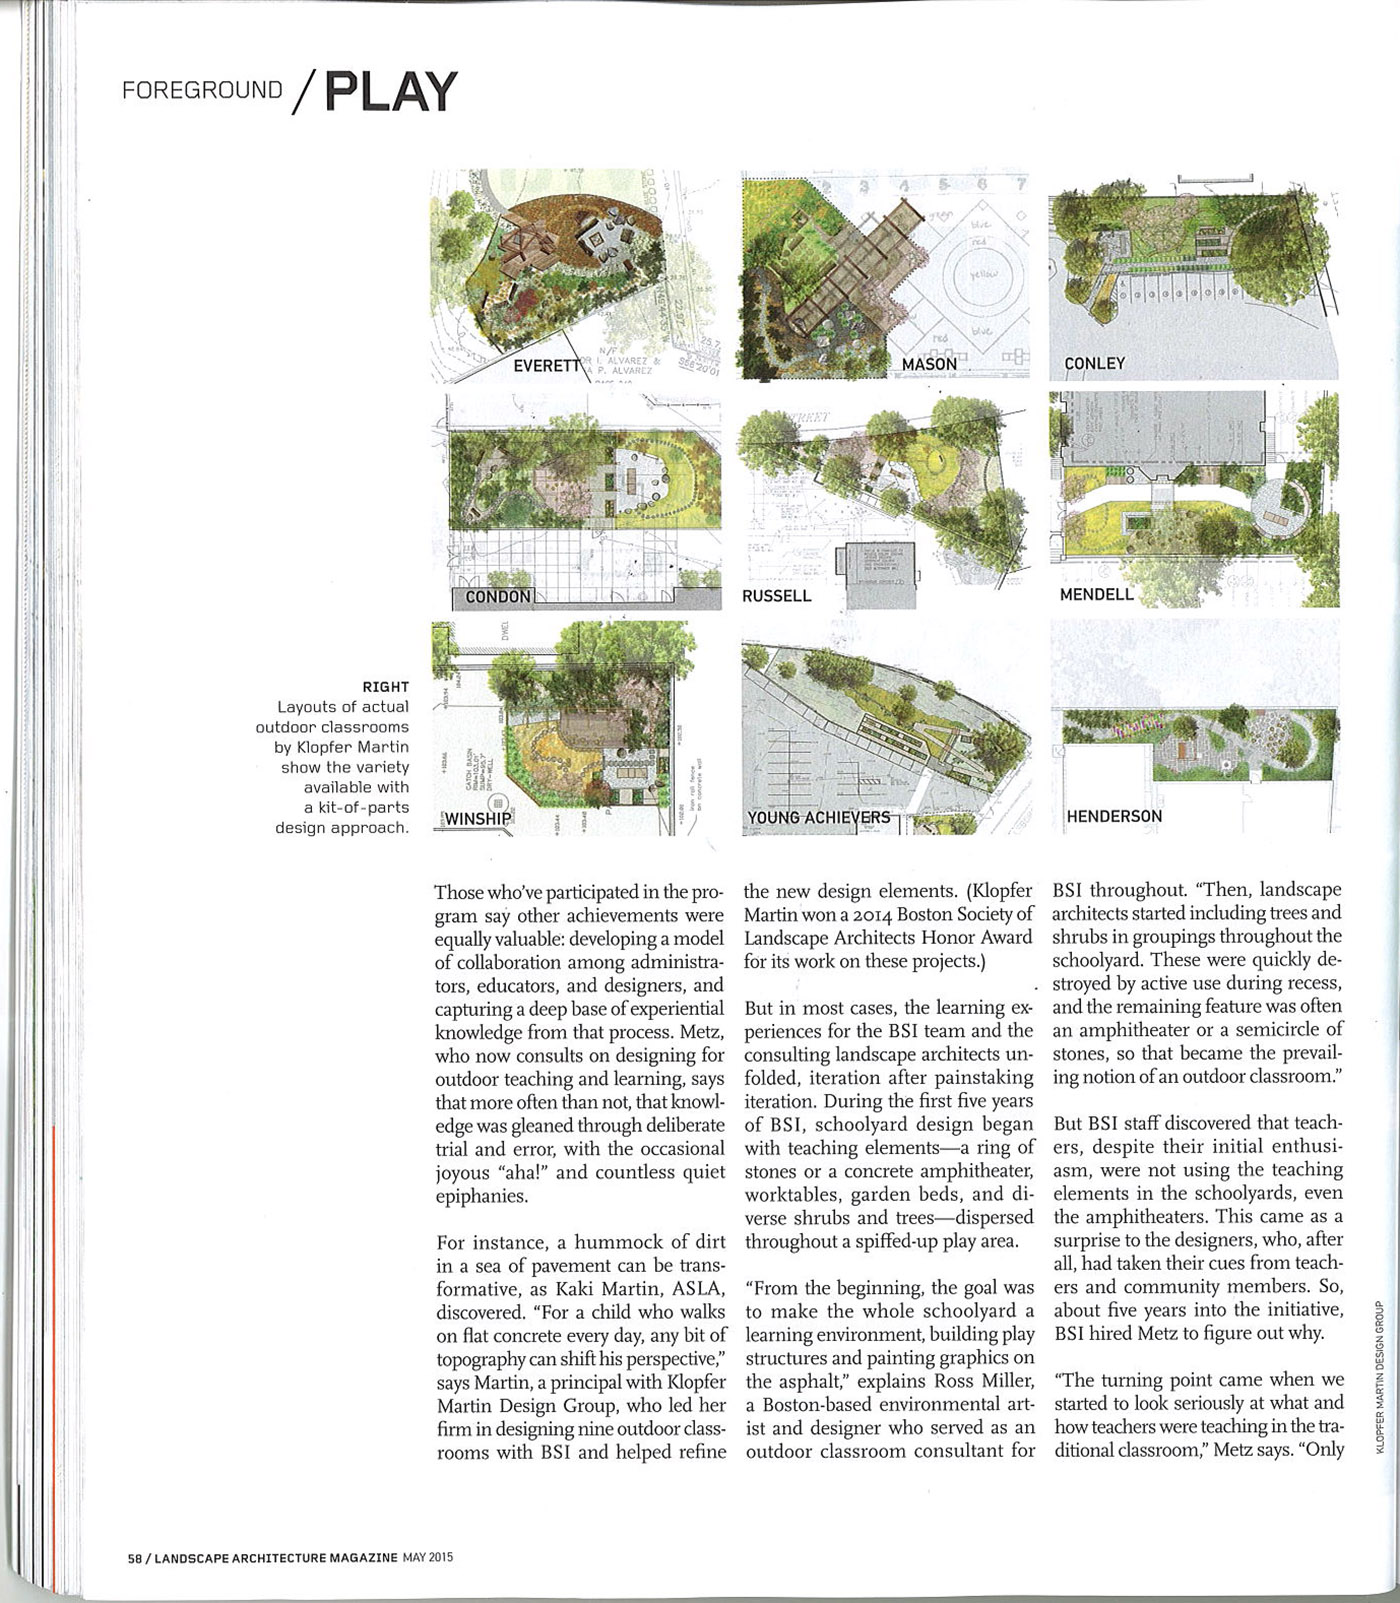 58 klopfer martin landscape architecture magazine.jpg